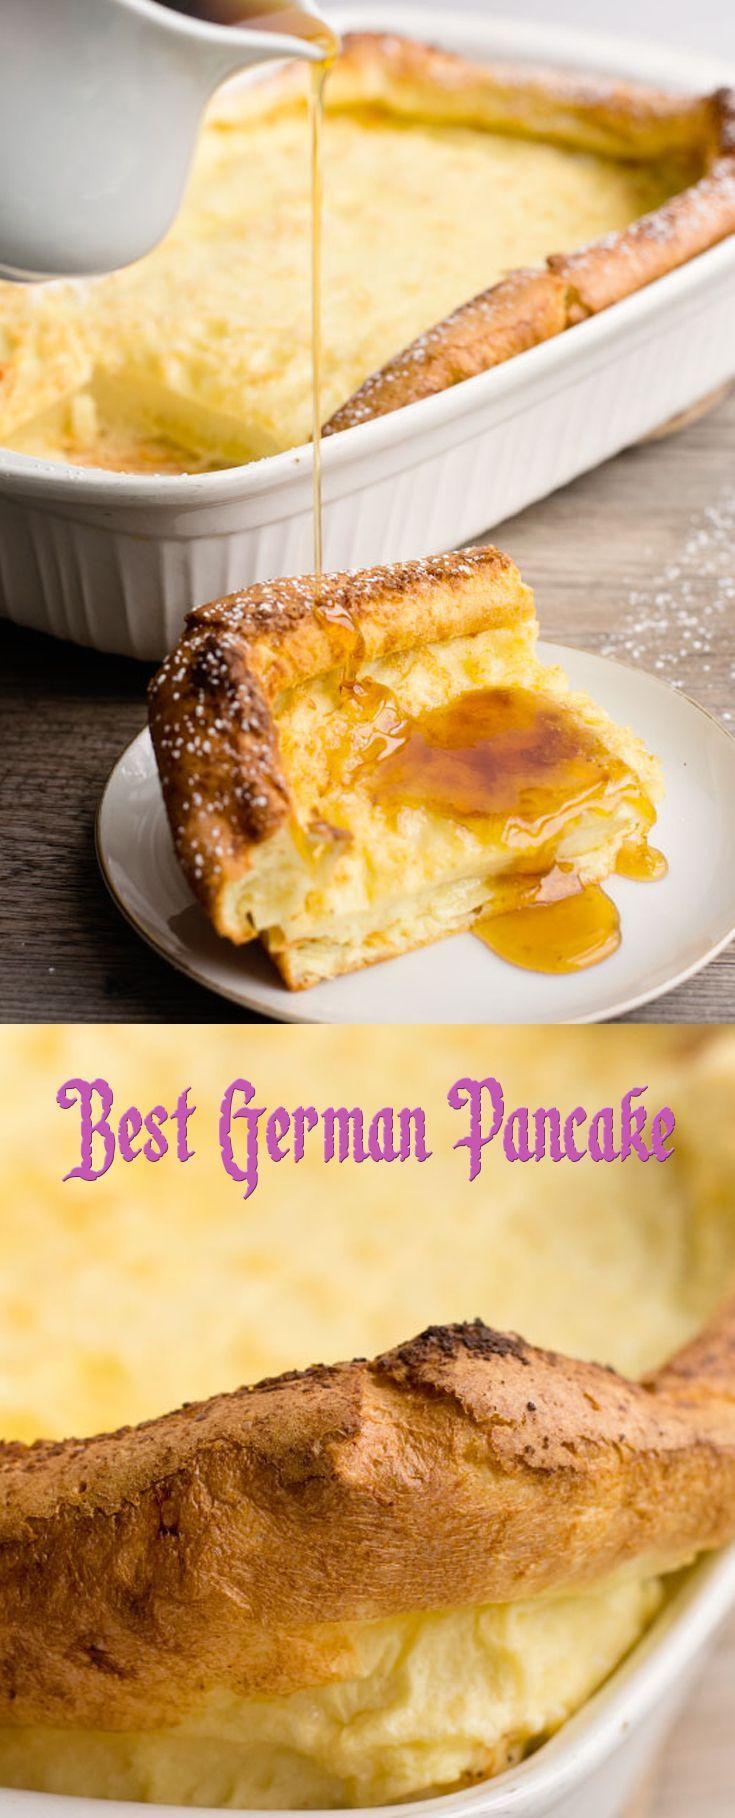 Best German Pancake